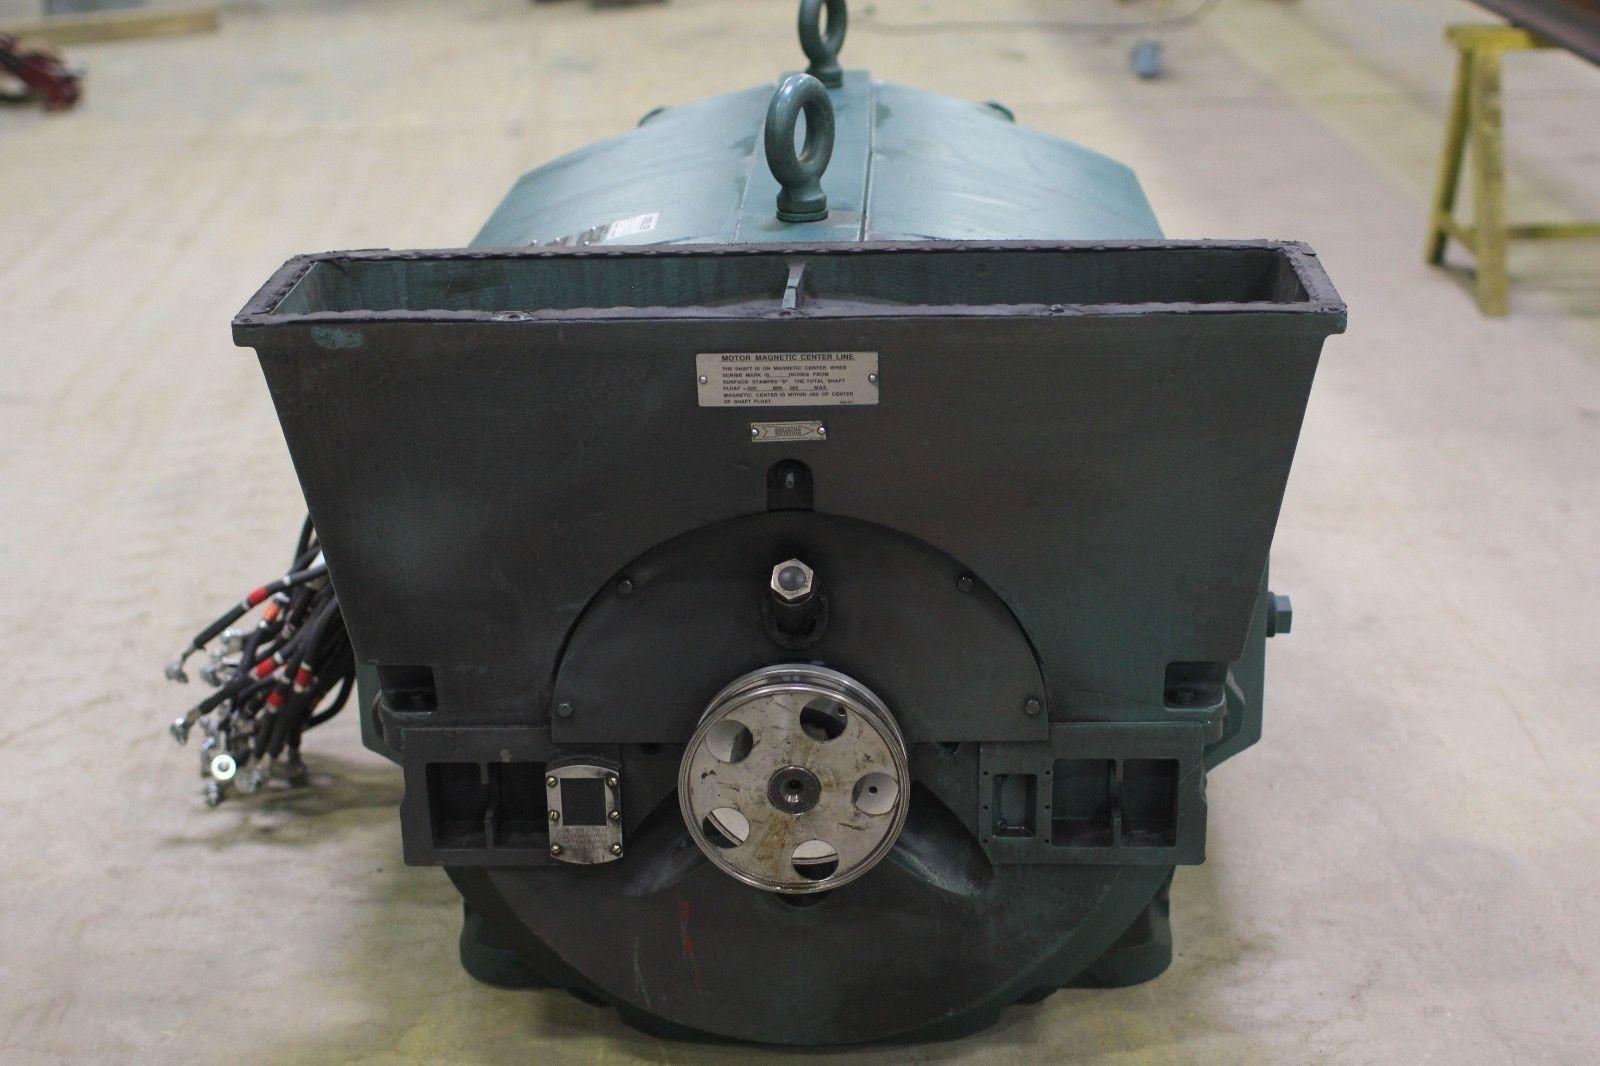 Reliance Motor York Enfriador Ys Nn Nn S7 024 25253 019